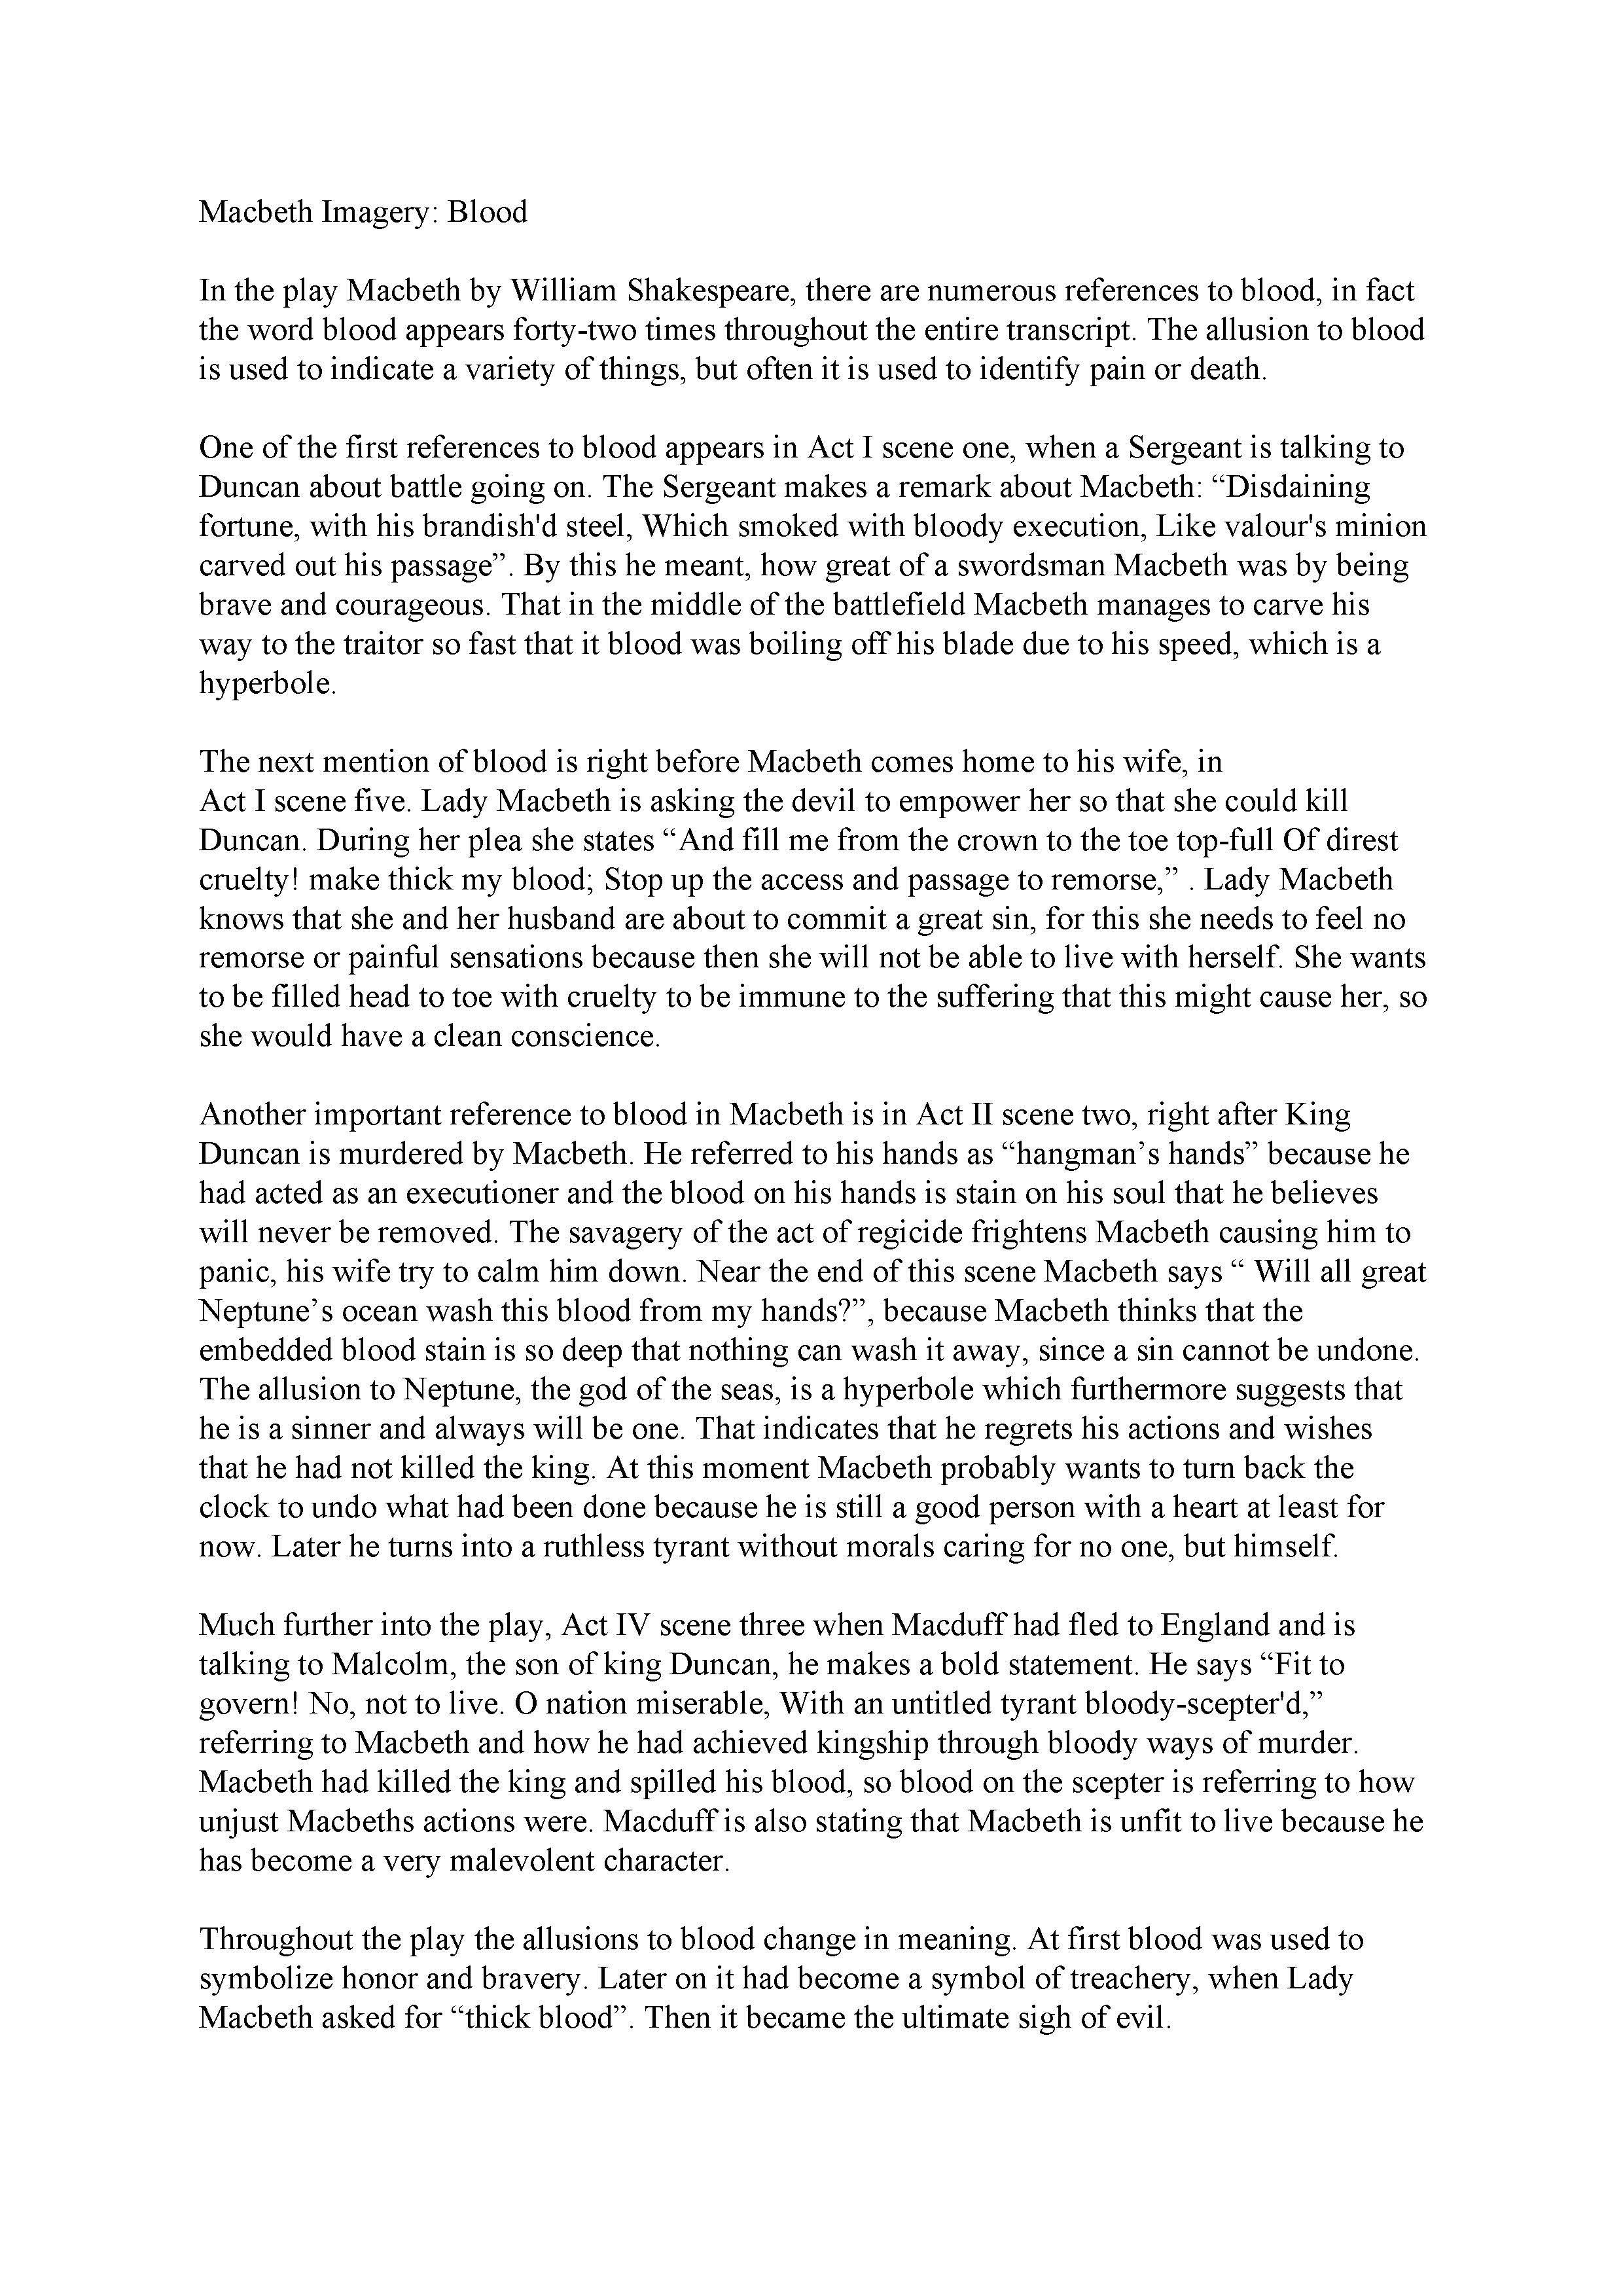 005 Essay Example Macbeth Sample Racism Dreaded Today Full